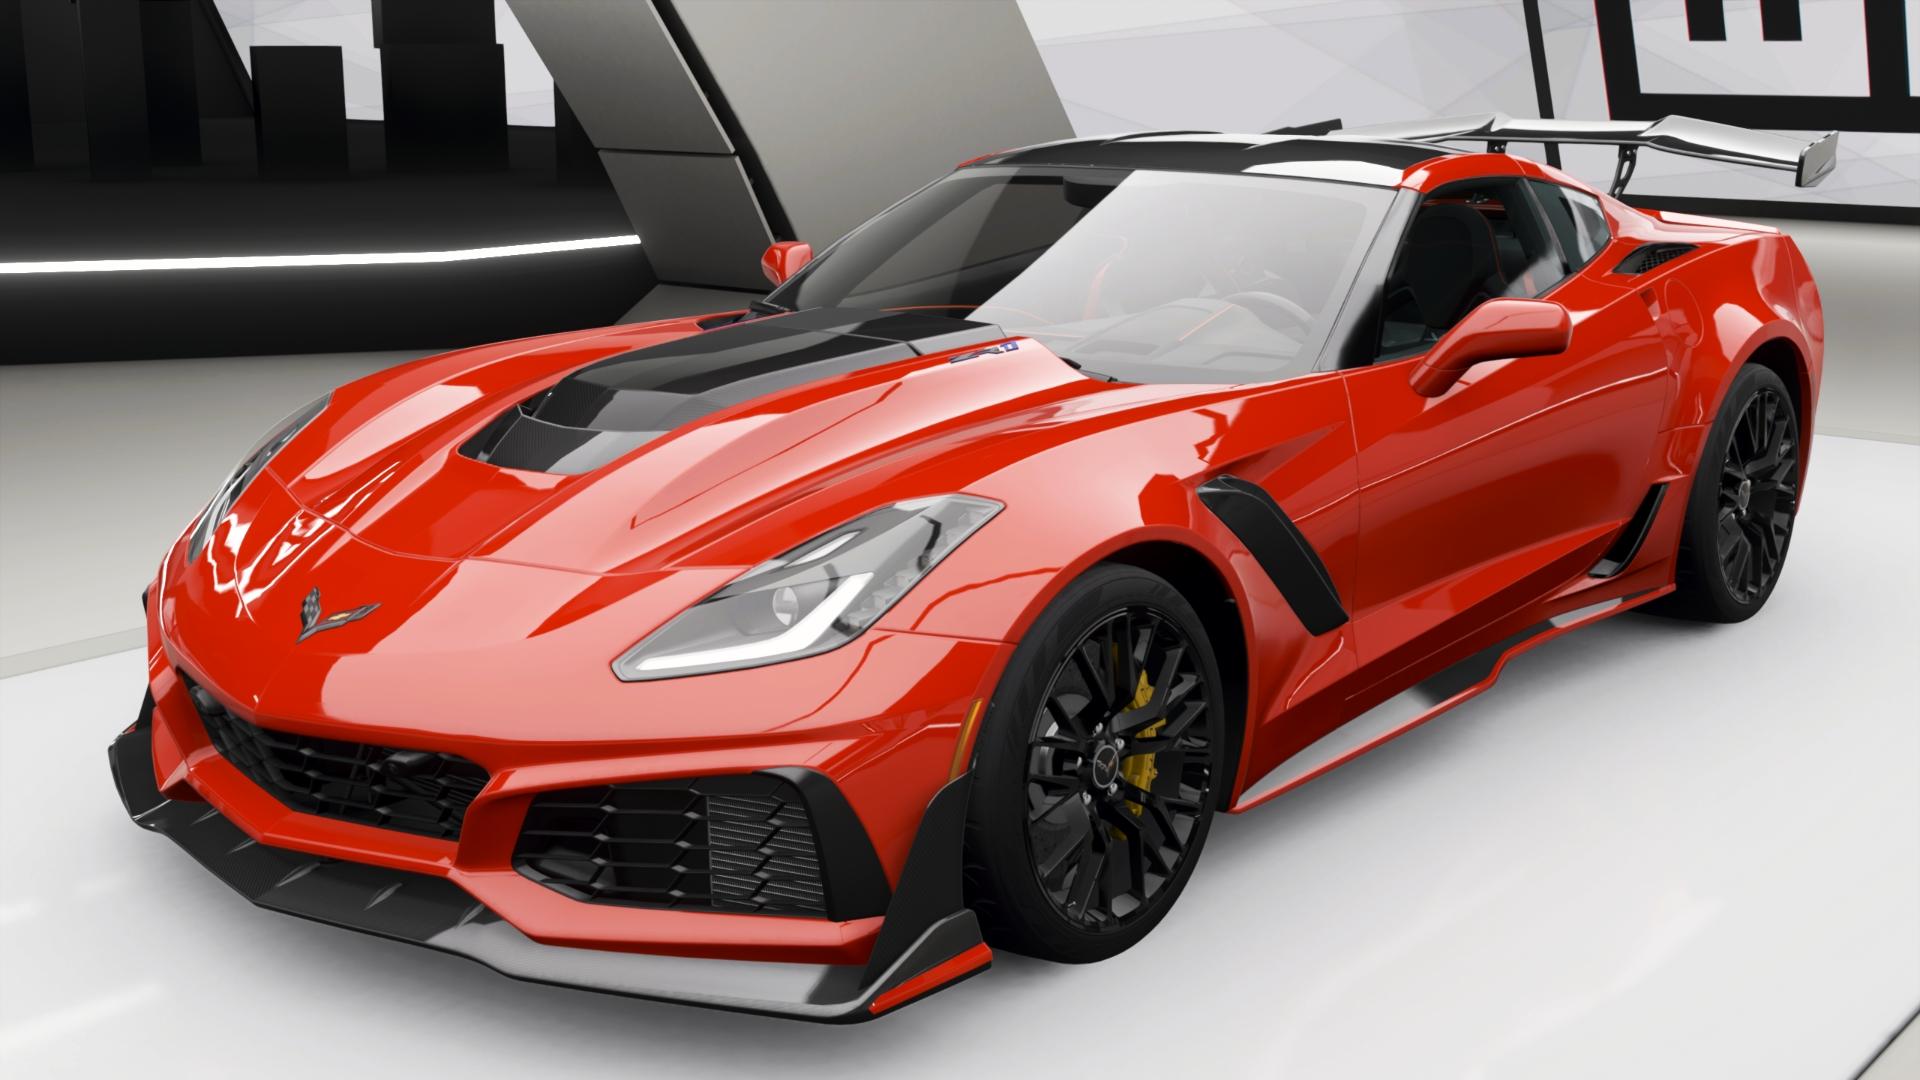 chevrolet corvette zr1 2019 forza motorsport wiki. Black Bedroom Furniture Sets. Home Design Ideas